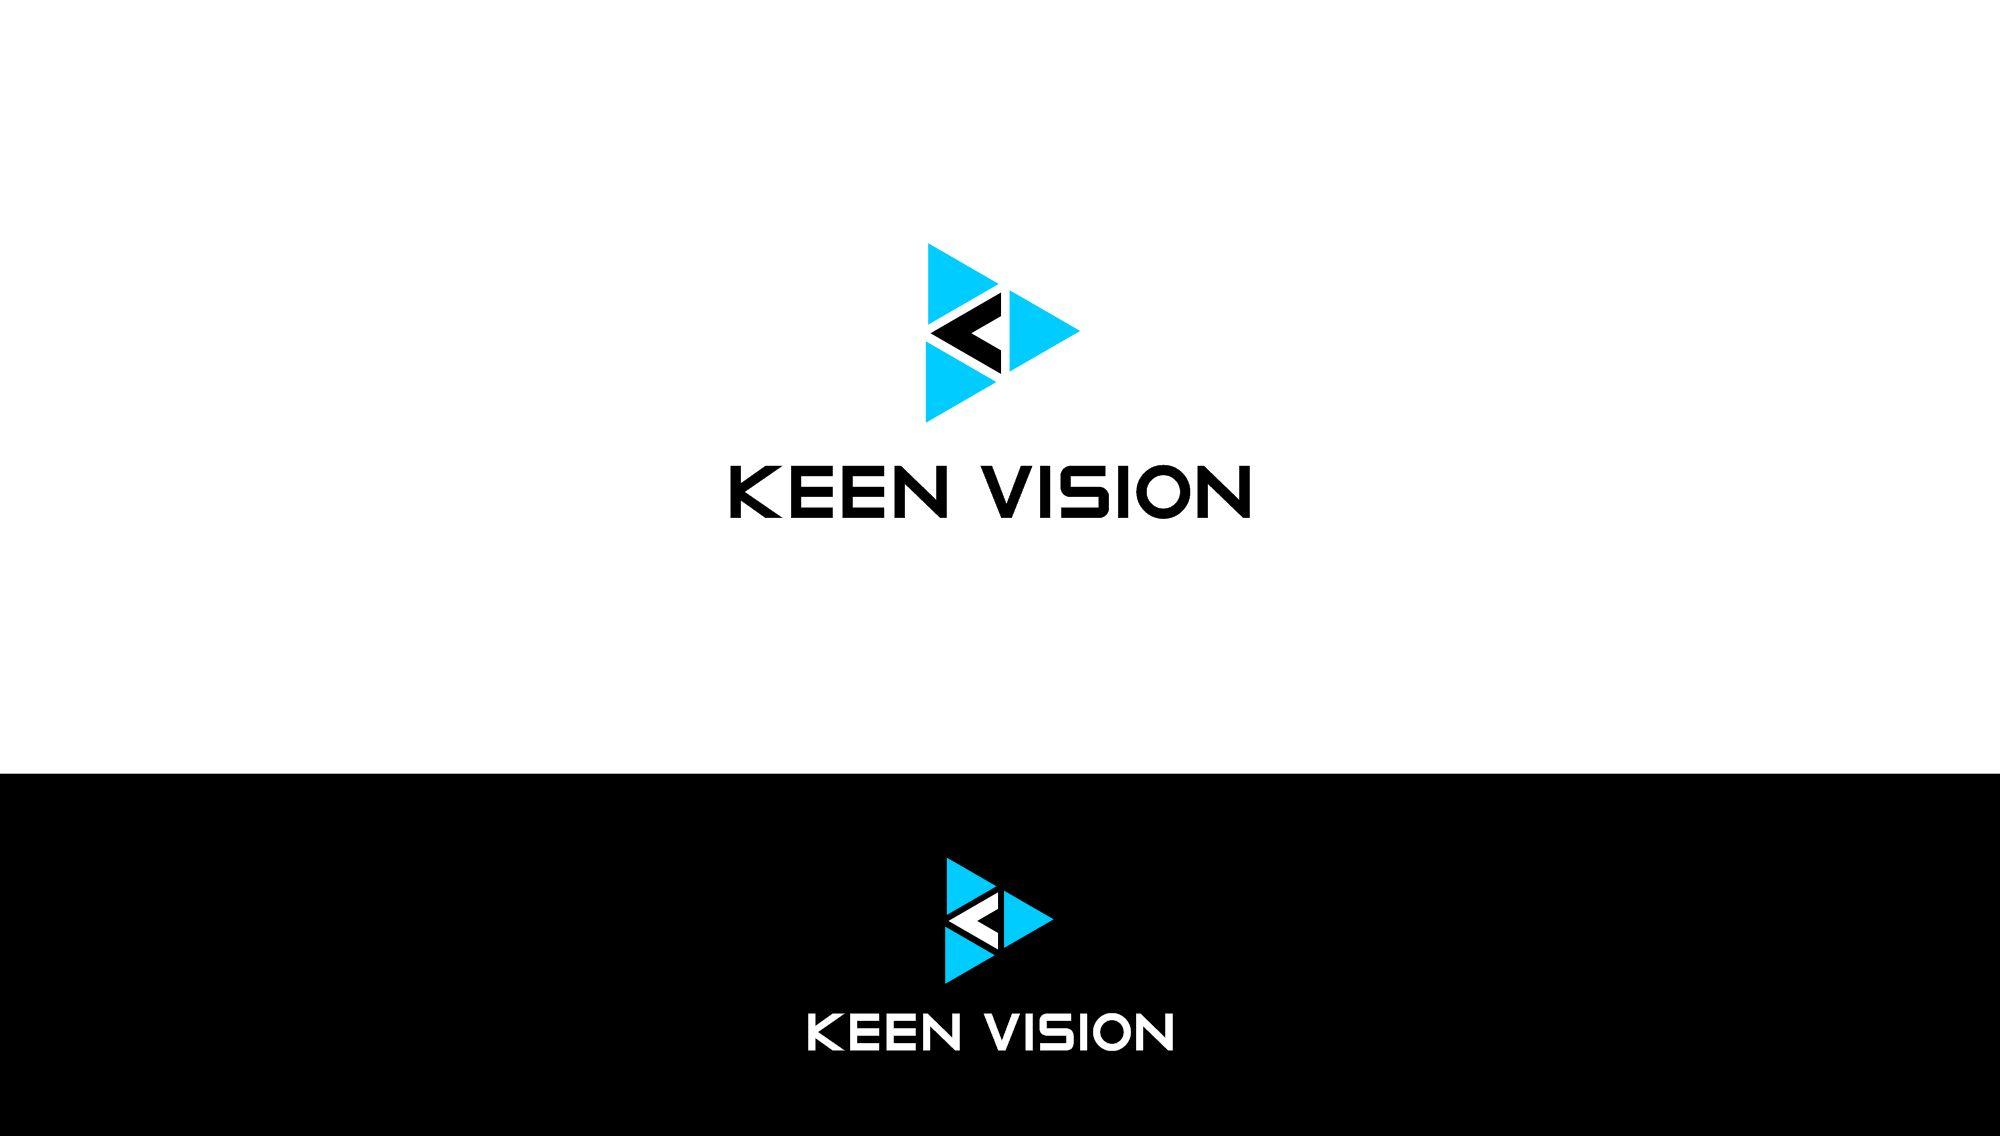 Логотип для KeenVision - дизайнер markosov